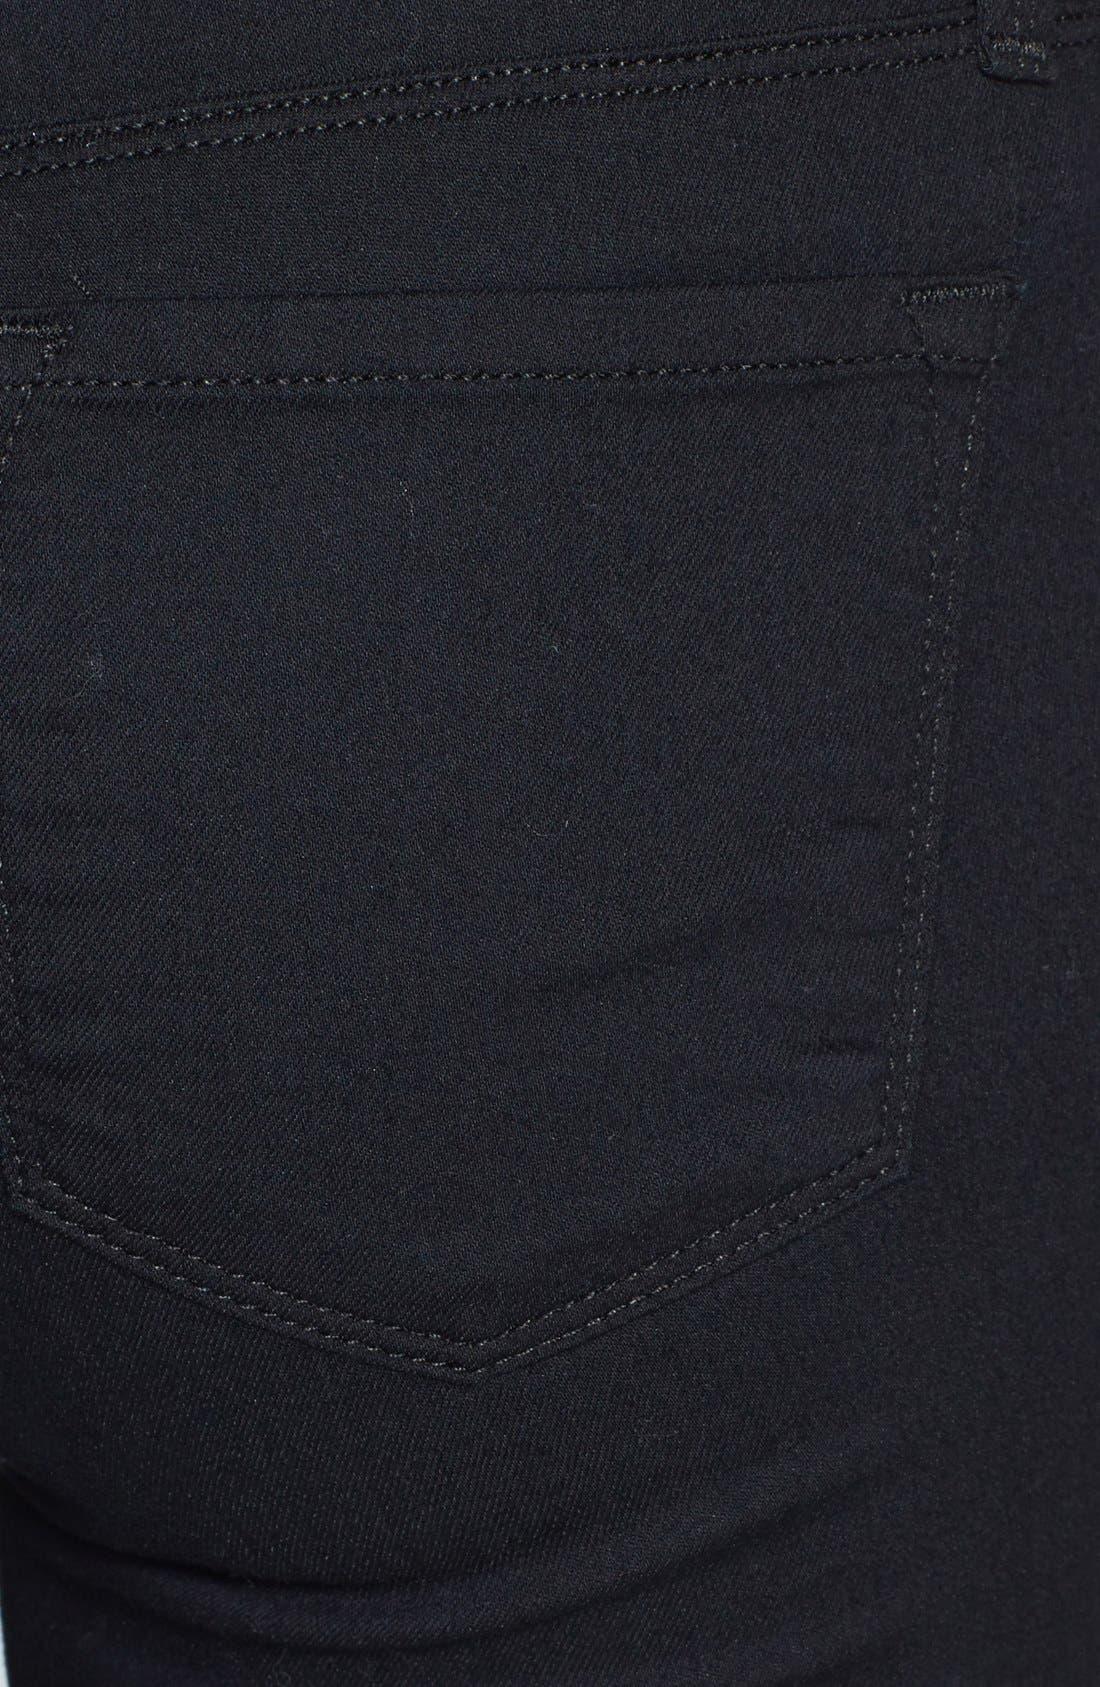 Alternate Image 3  - J Brand Super Skinny Jeans (Pitch Black)